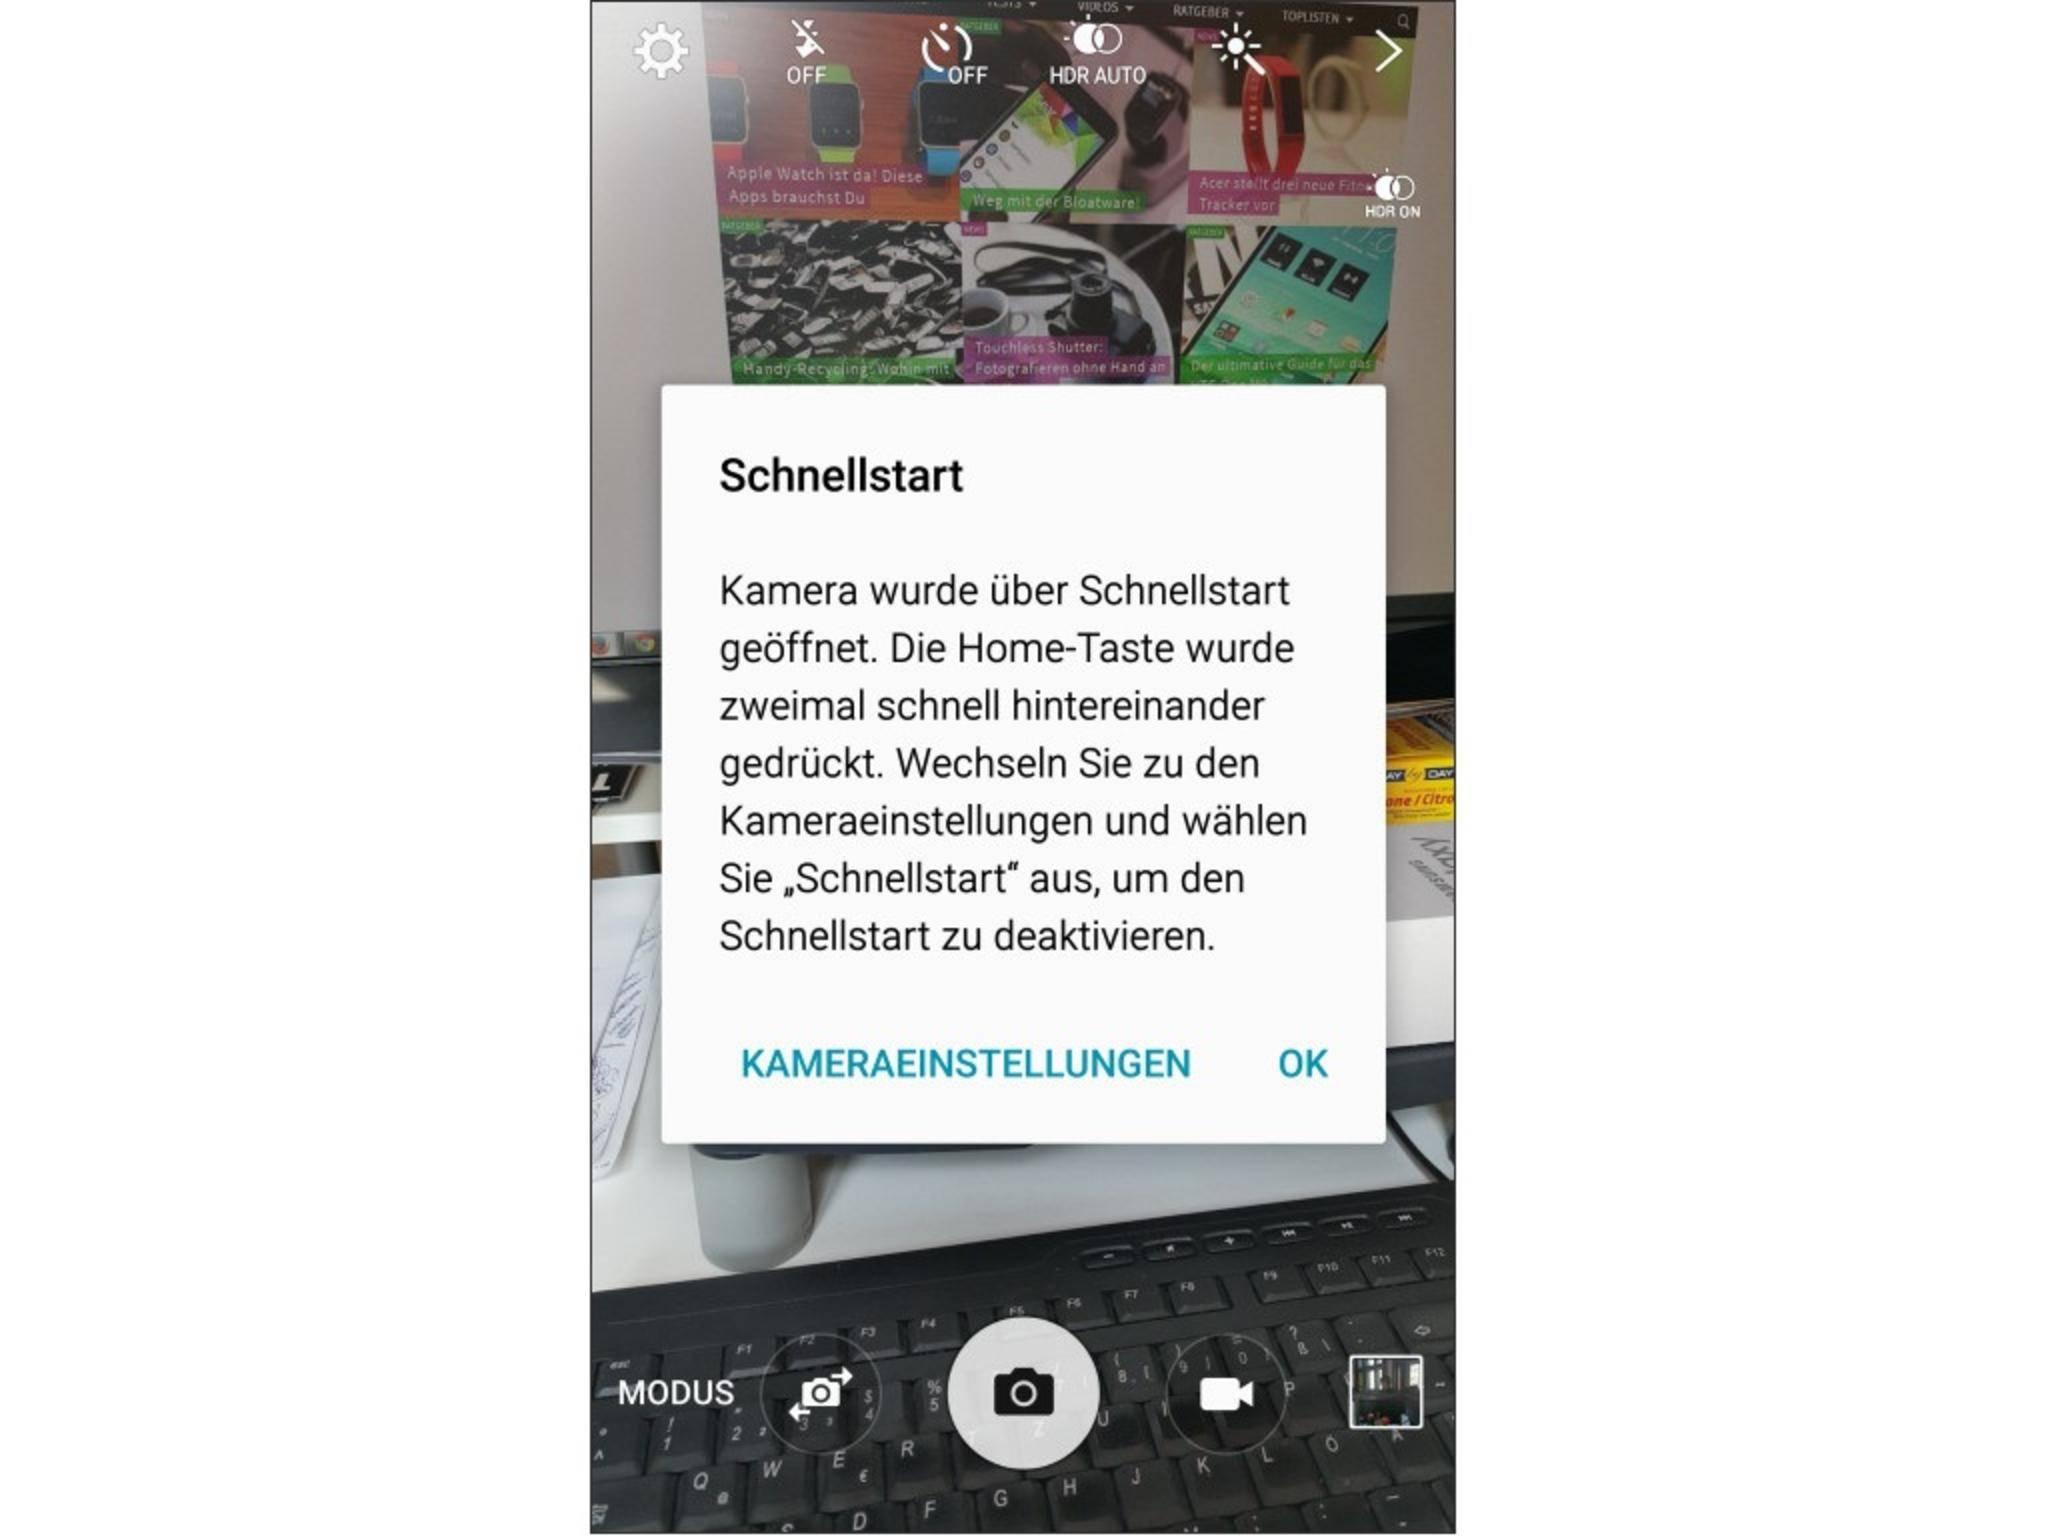 Galaxy S6 Screenshot 38